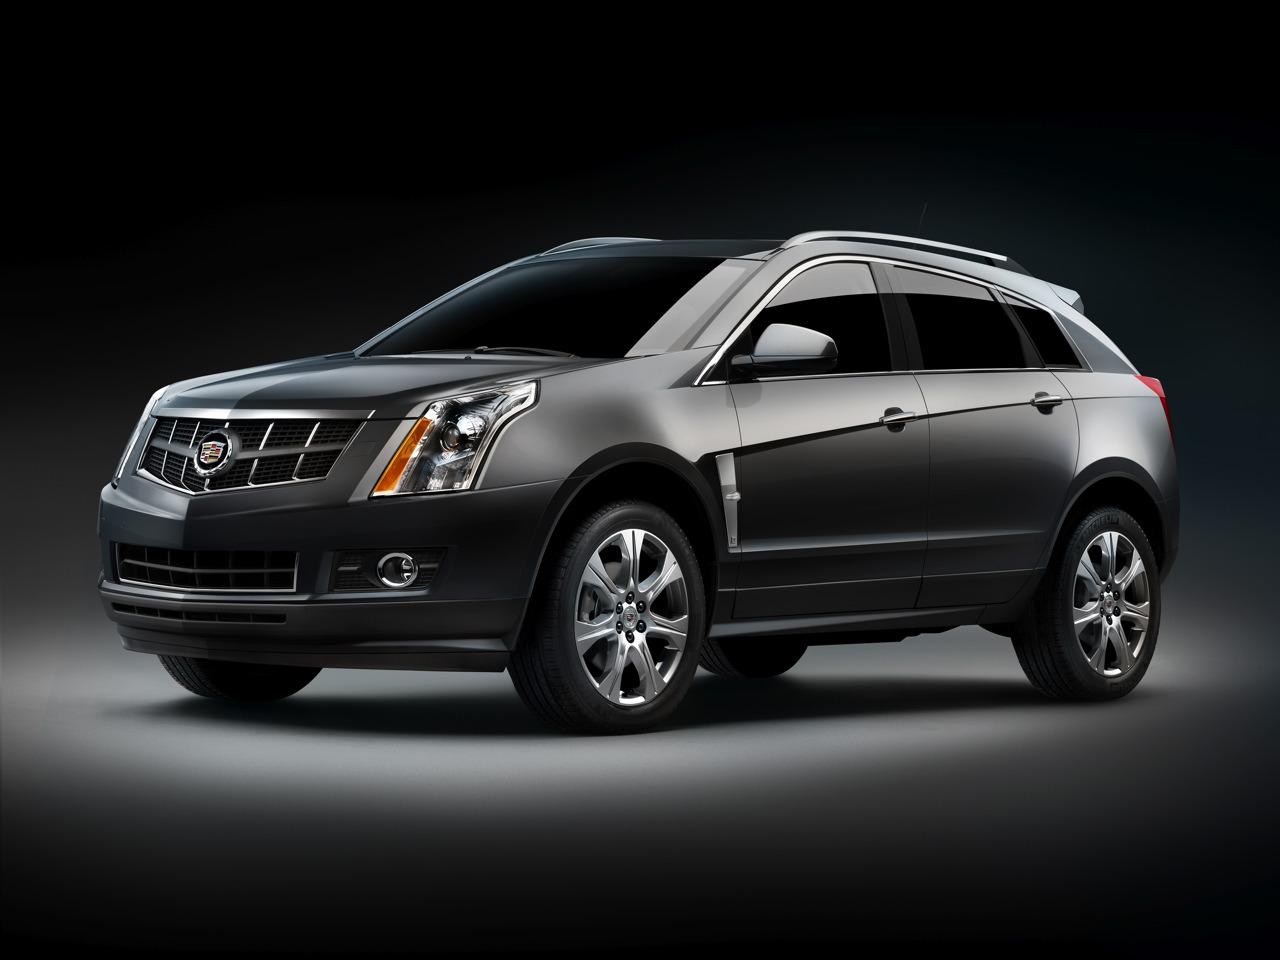 Cadillac SRX (2010)